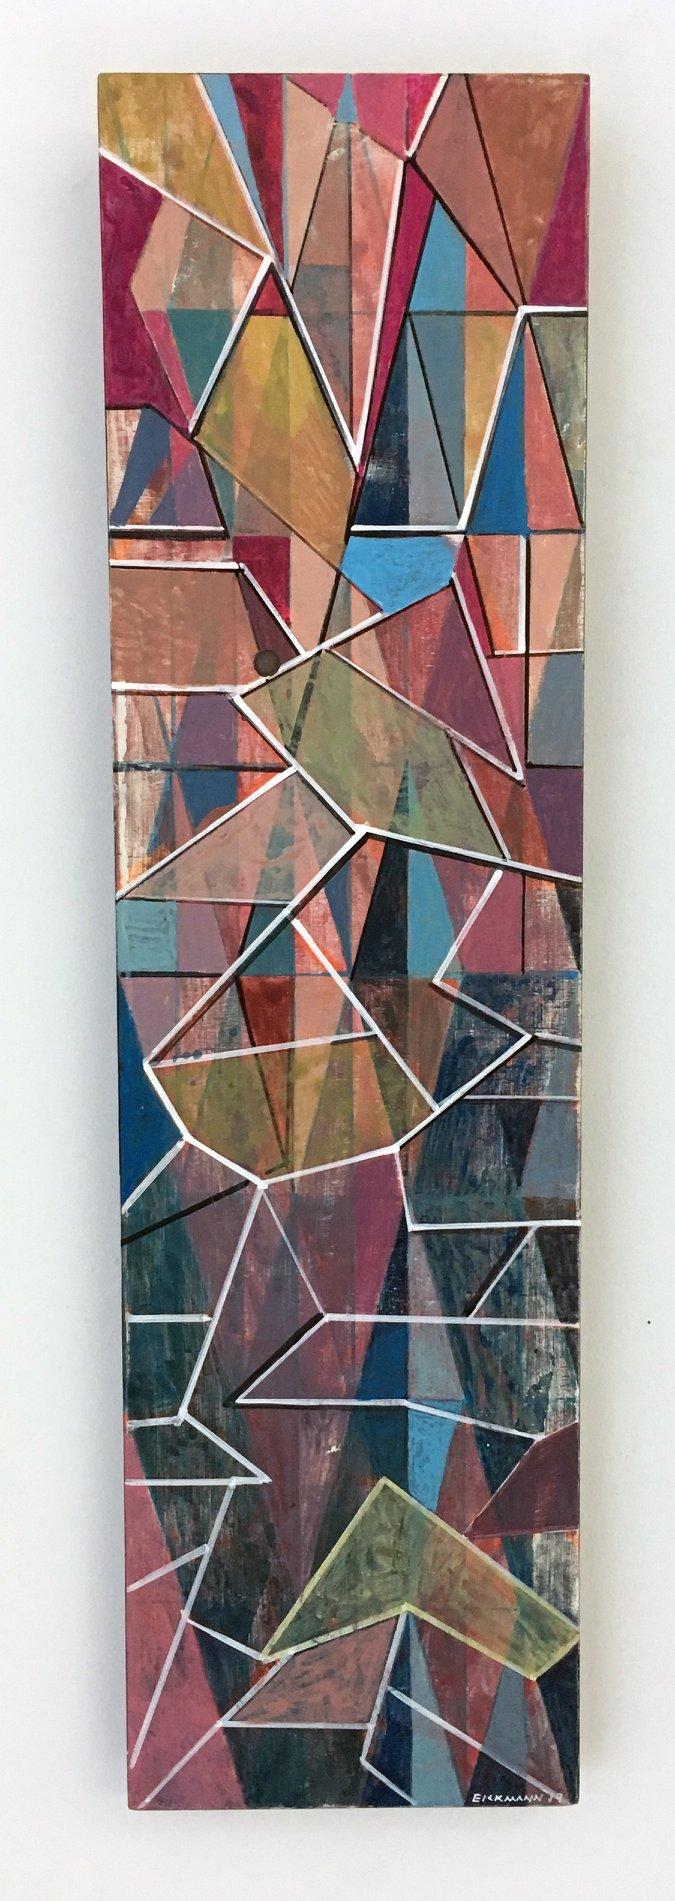 "Eric Eickmann - ""Gamogenesis"" Insta: @eickmannart For Sale: $60"